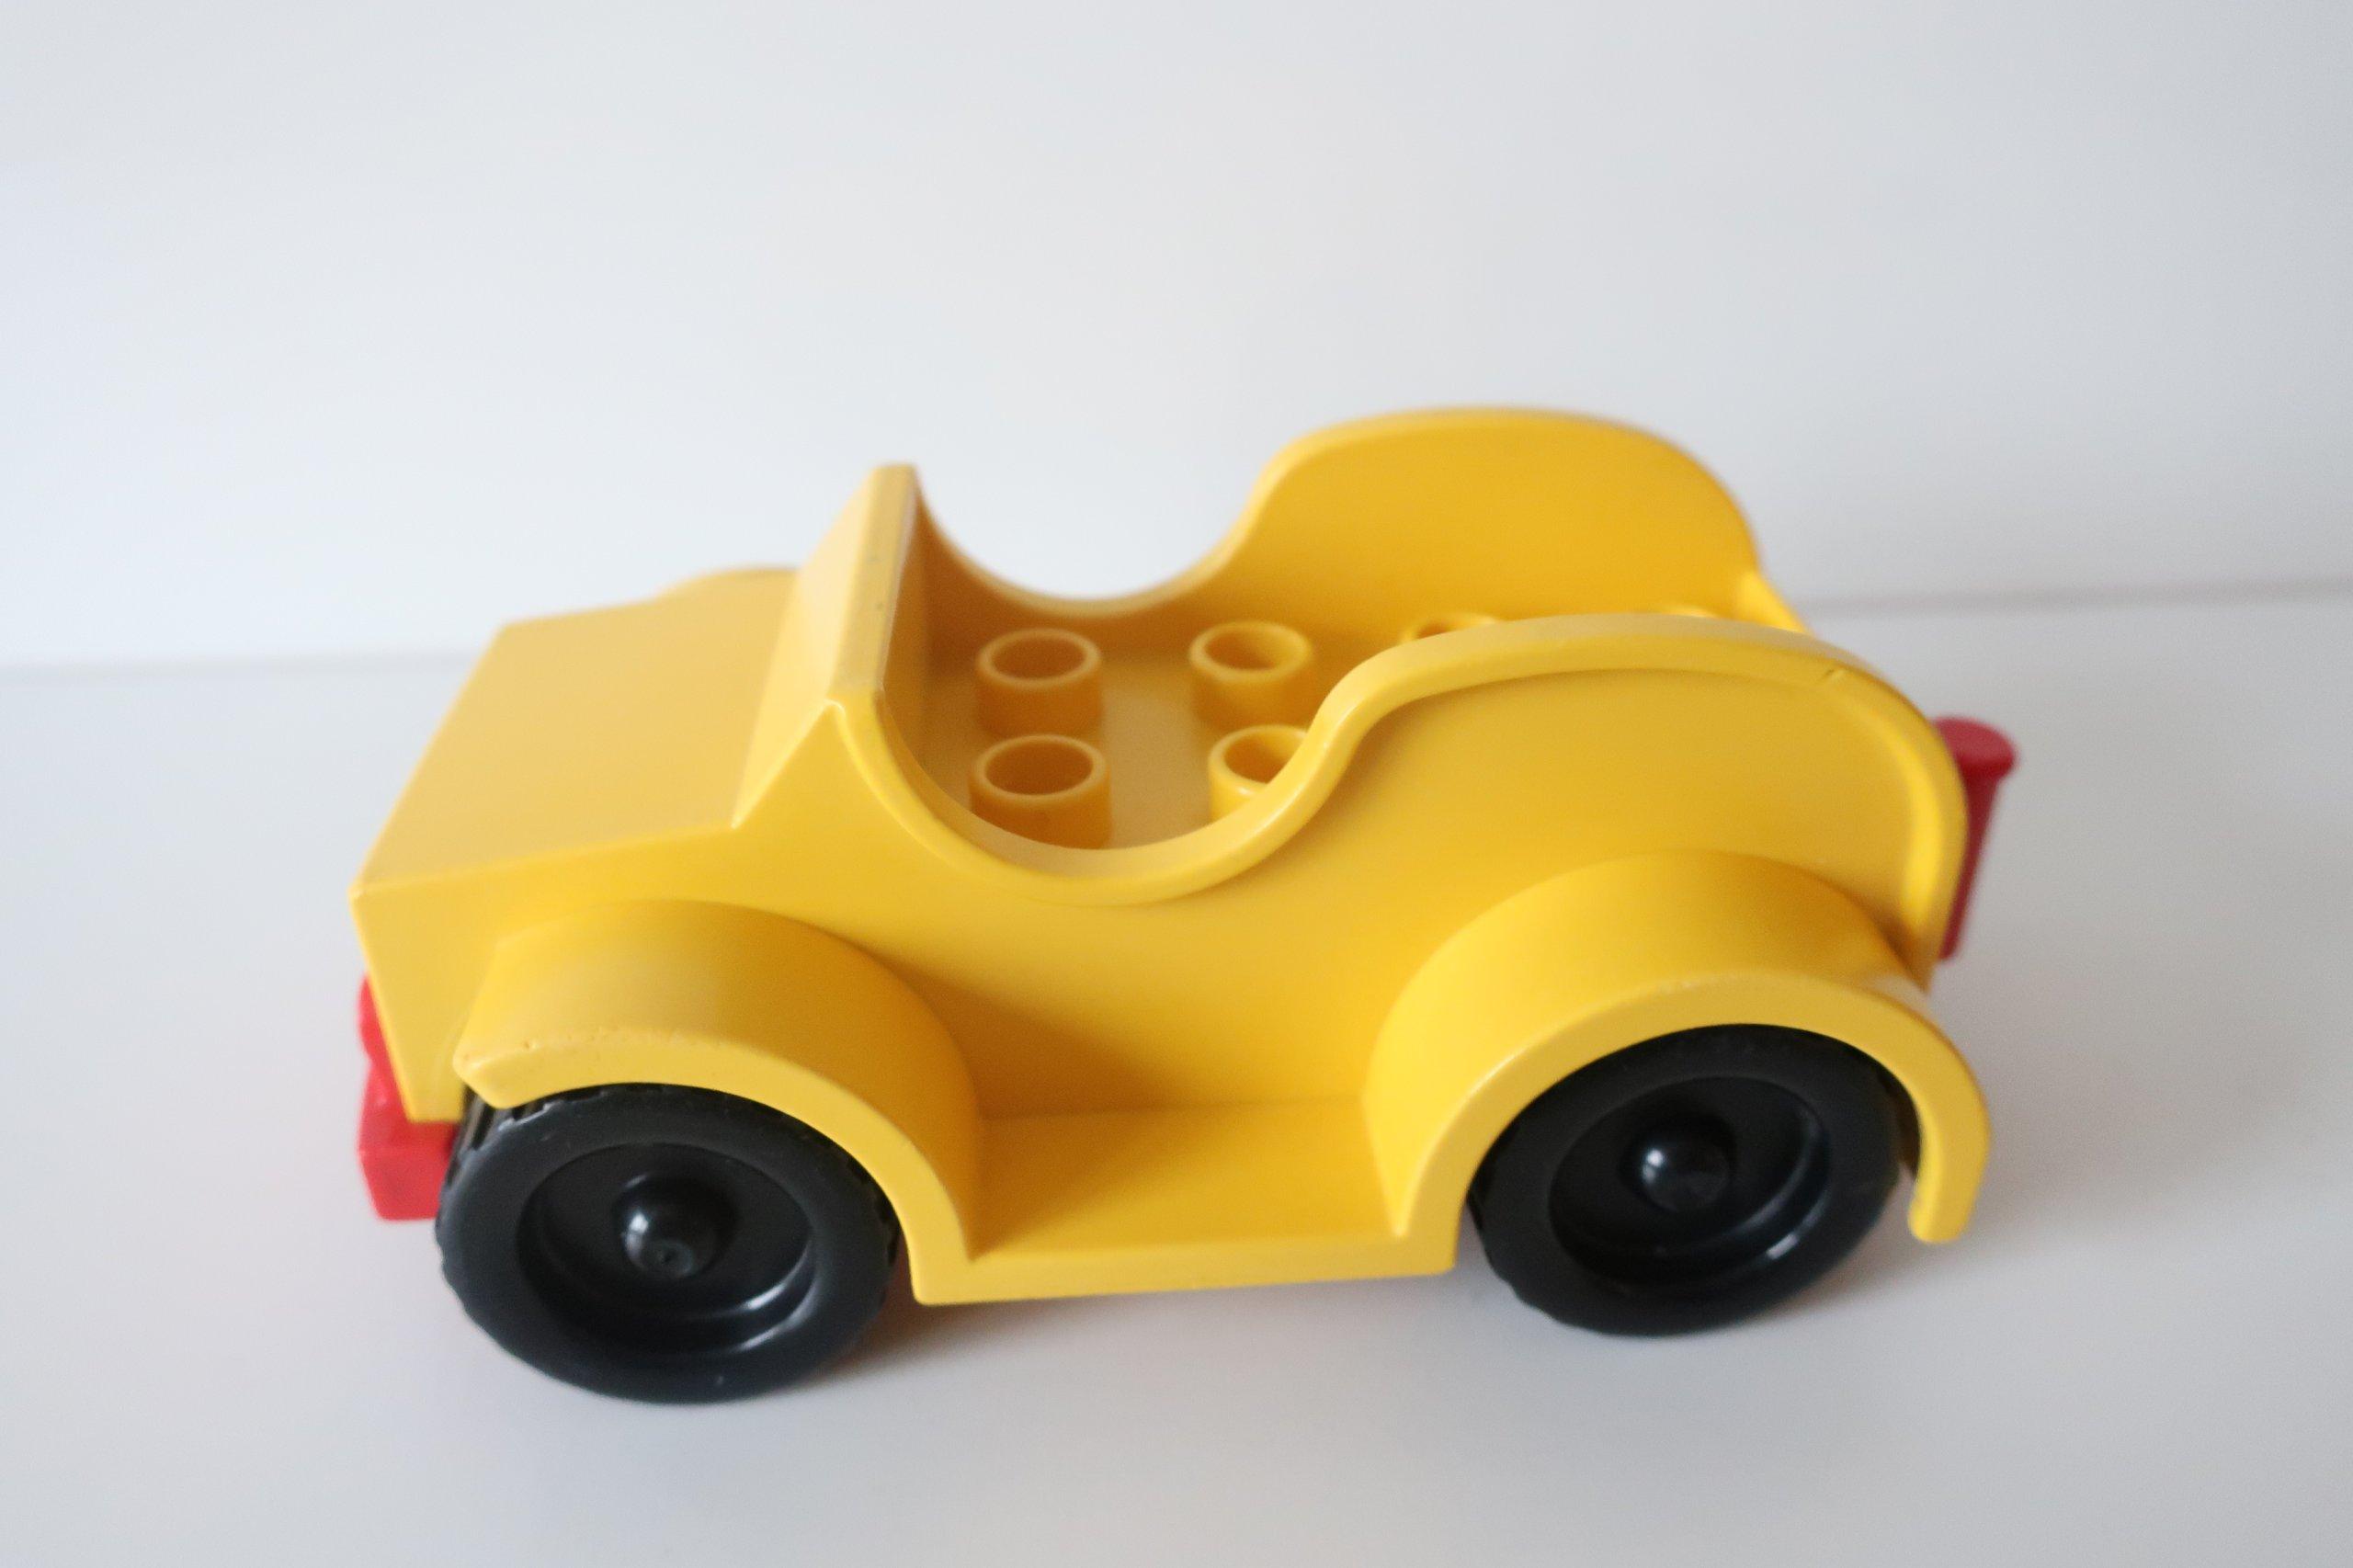 Kt Lego Duplo Autko żółte 7104242011 Oficjalne Archiwum Allegro